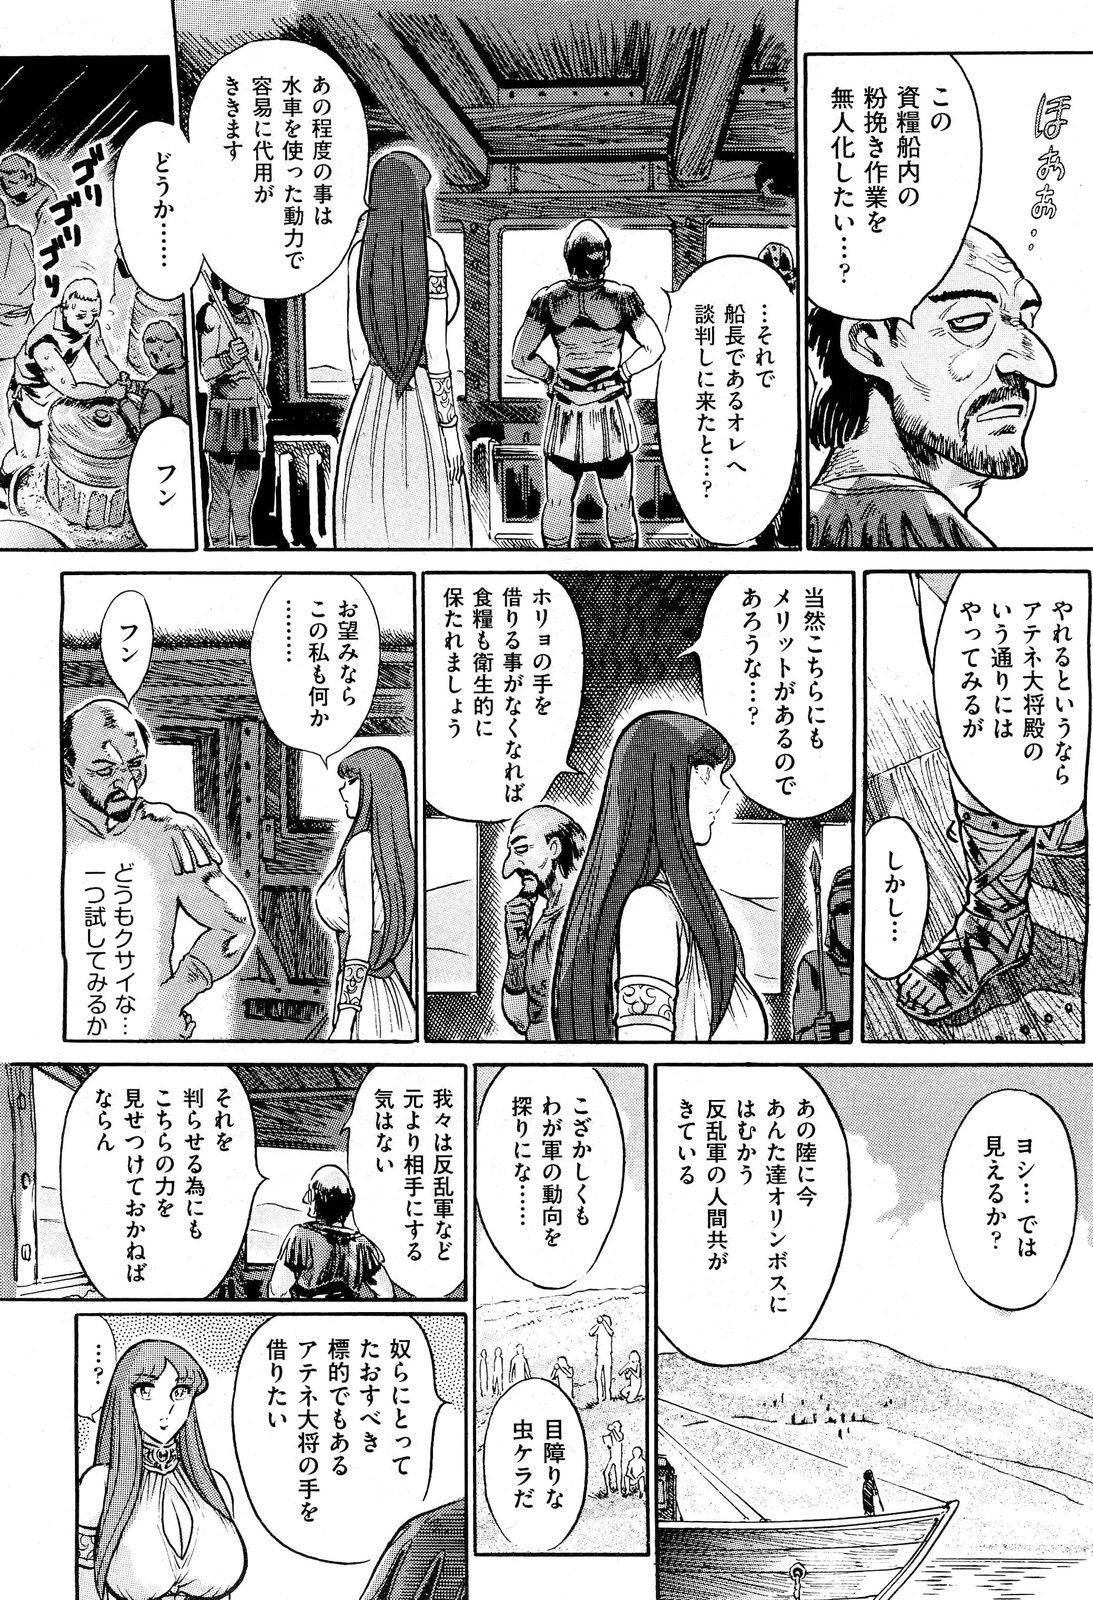 [Yosuteinu] The crysis of greece chapter 1-3 (FINAL)  - saint seiya 68